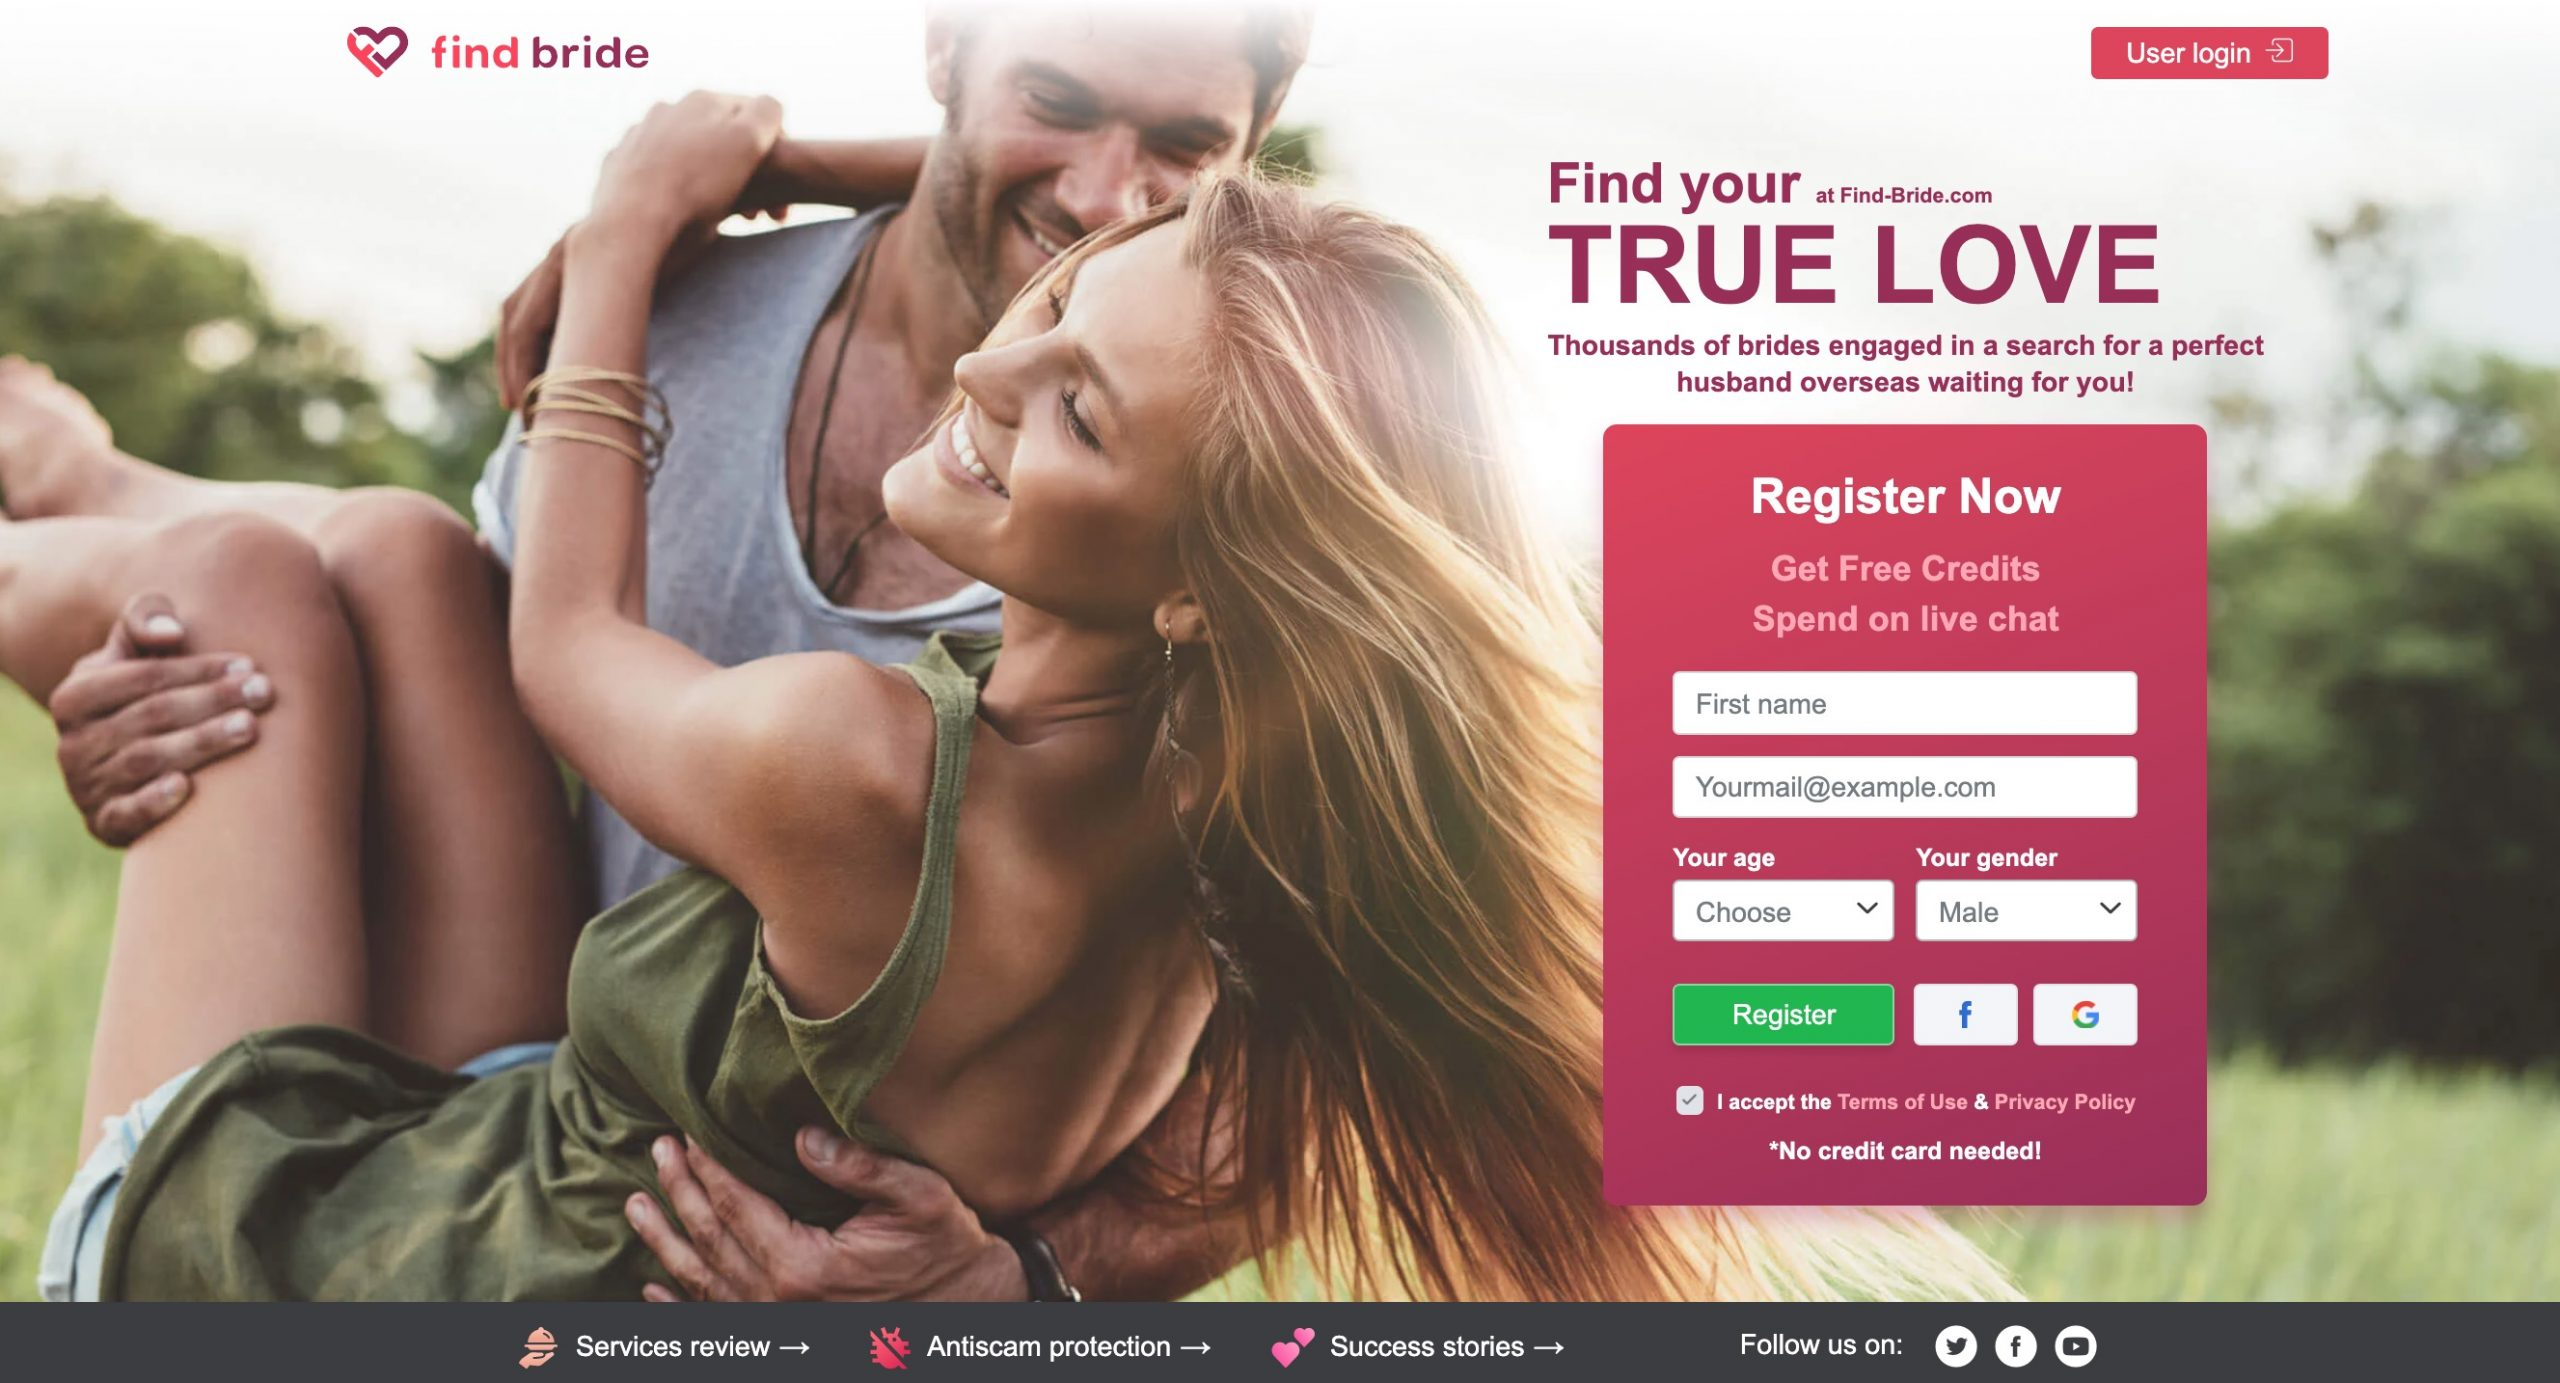 Find-Bride main page